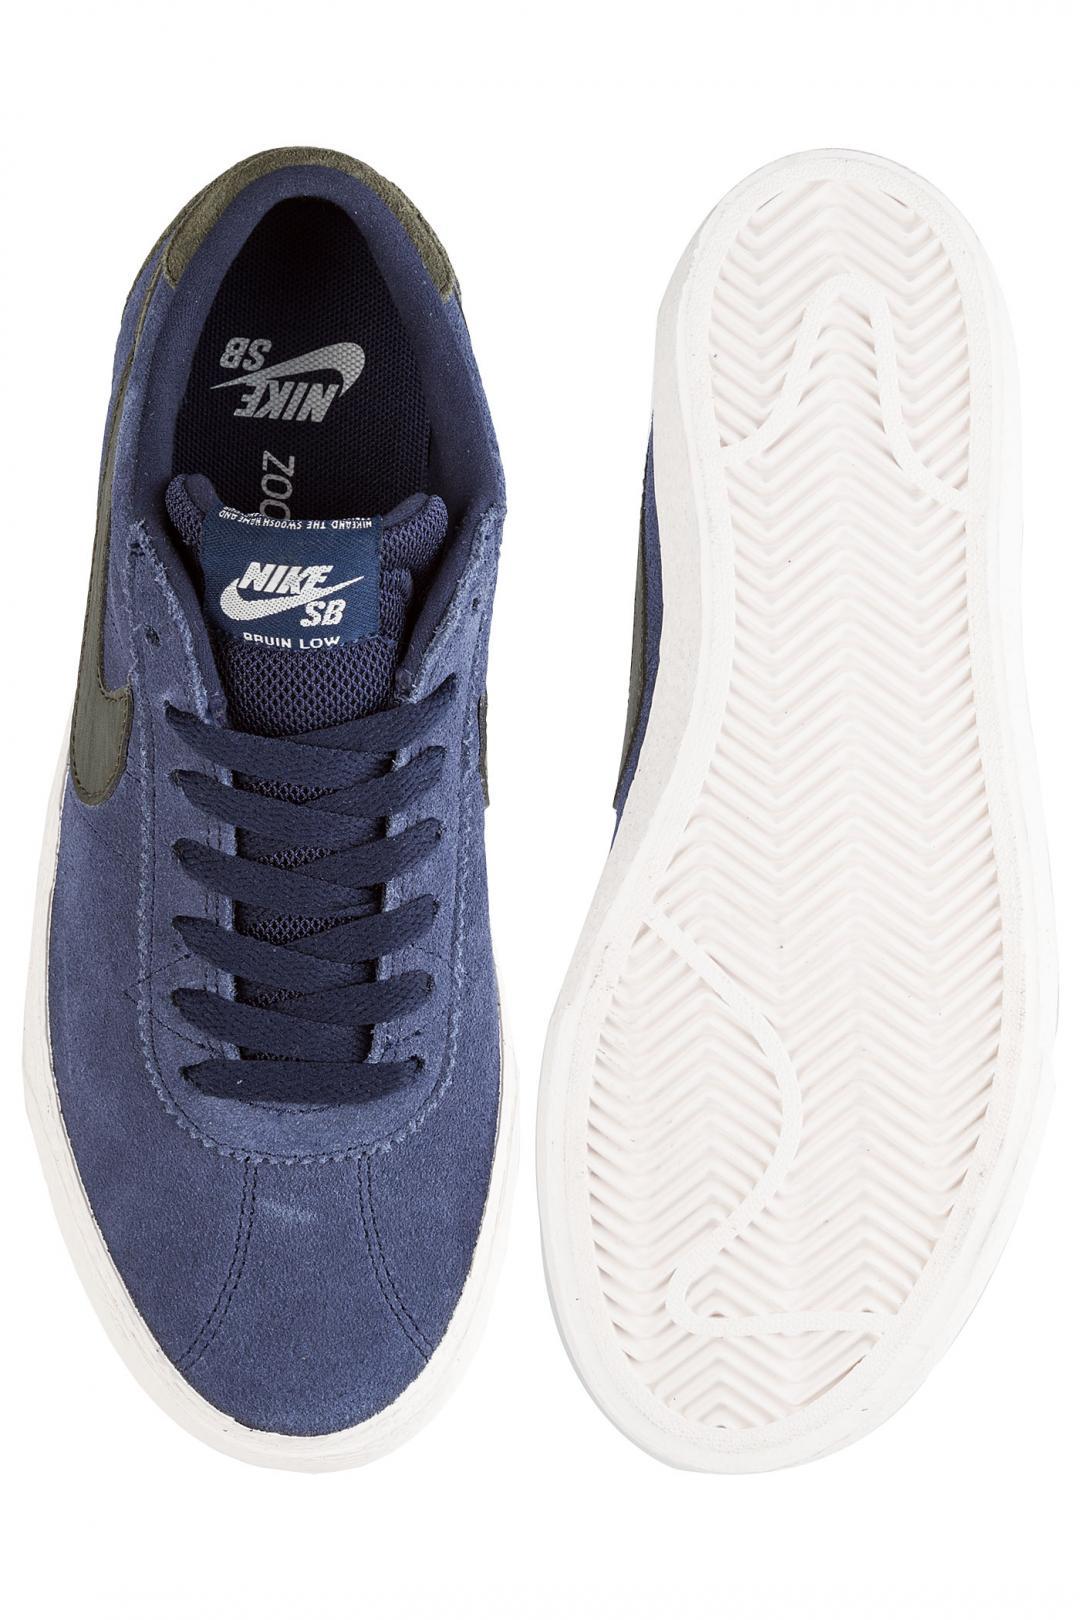 Donna Nike SB Bruin Lo obsidian phantom | Sneakers low top